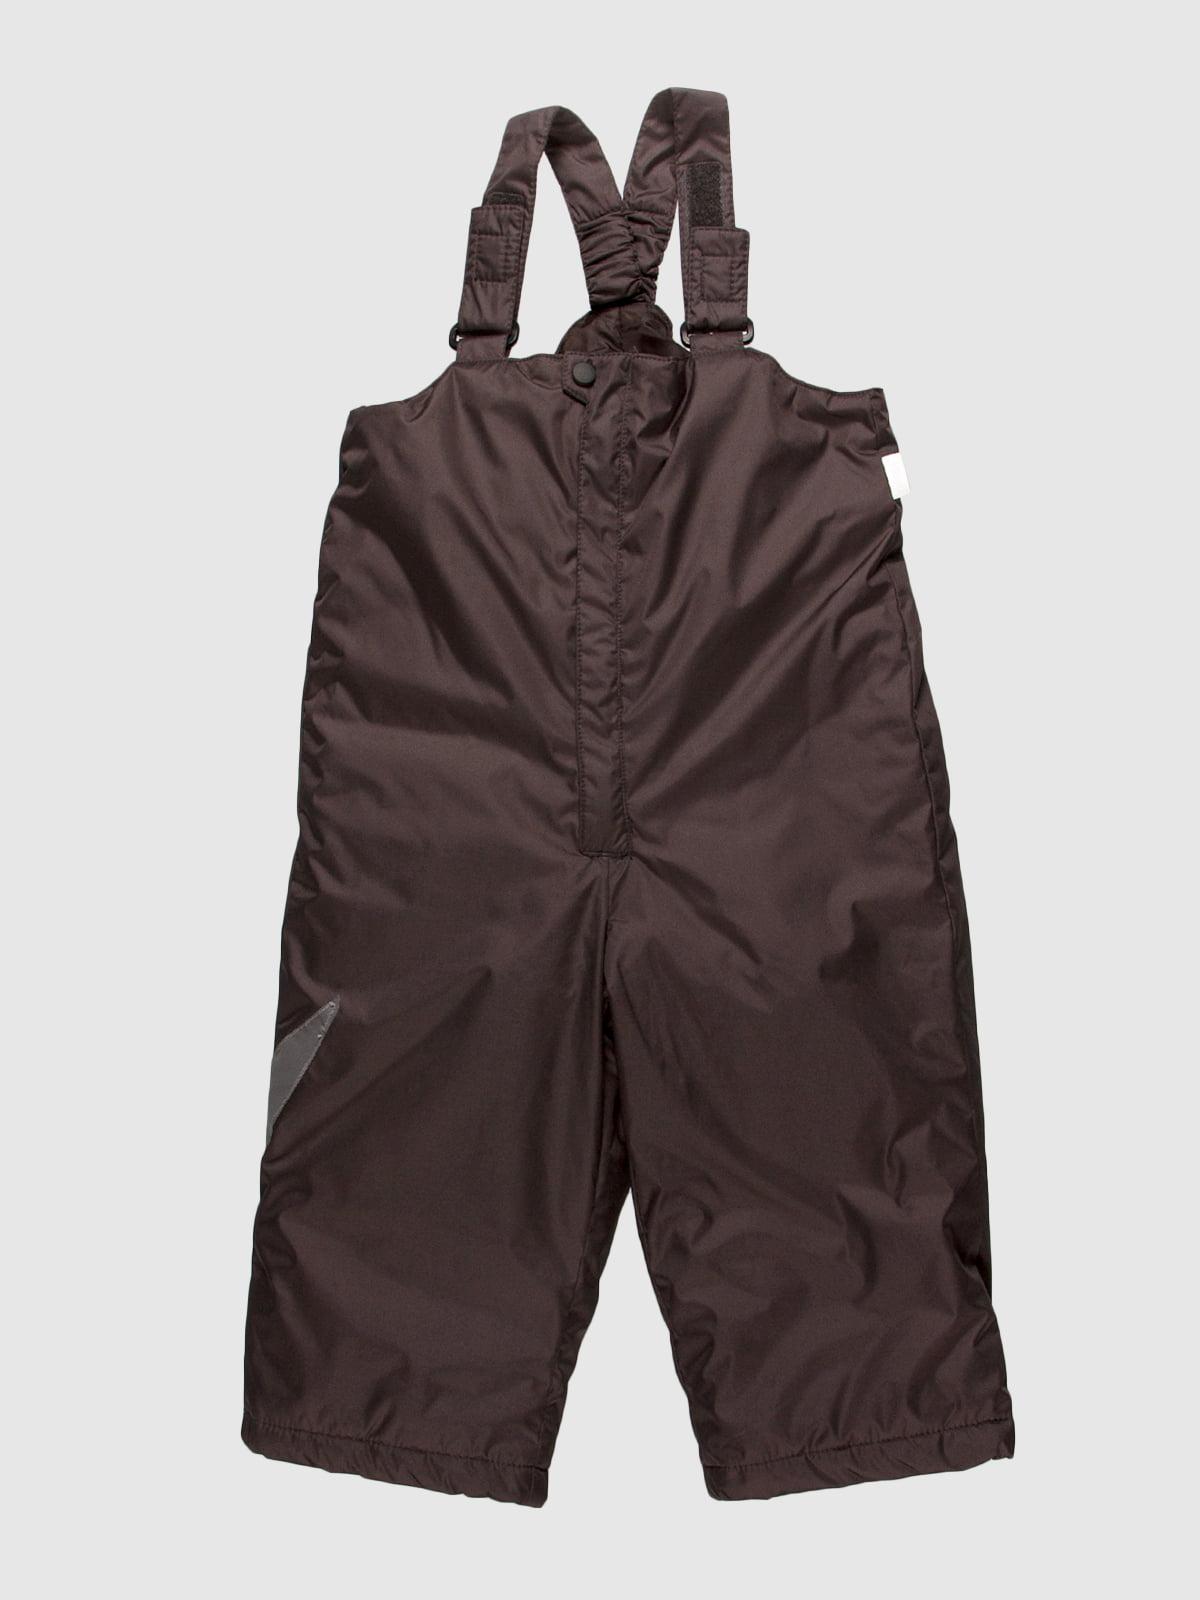 Полукомбинезон темно-серый   55225